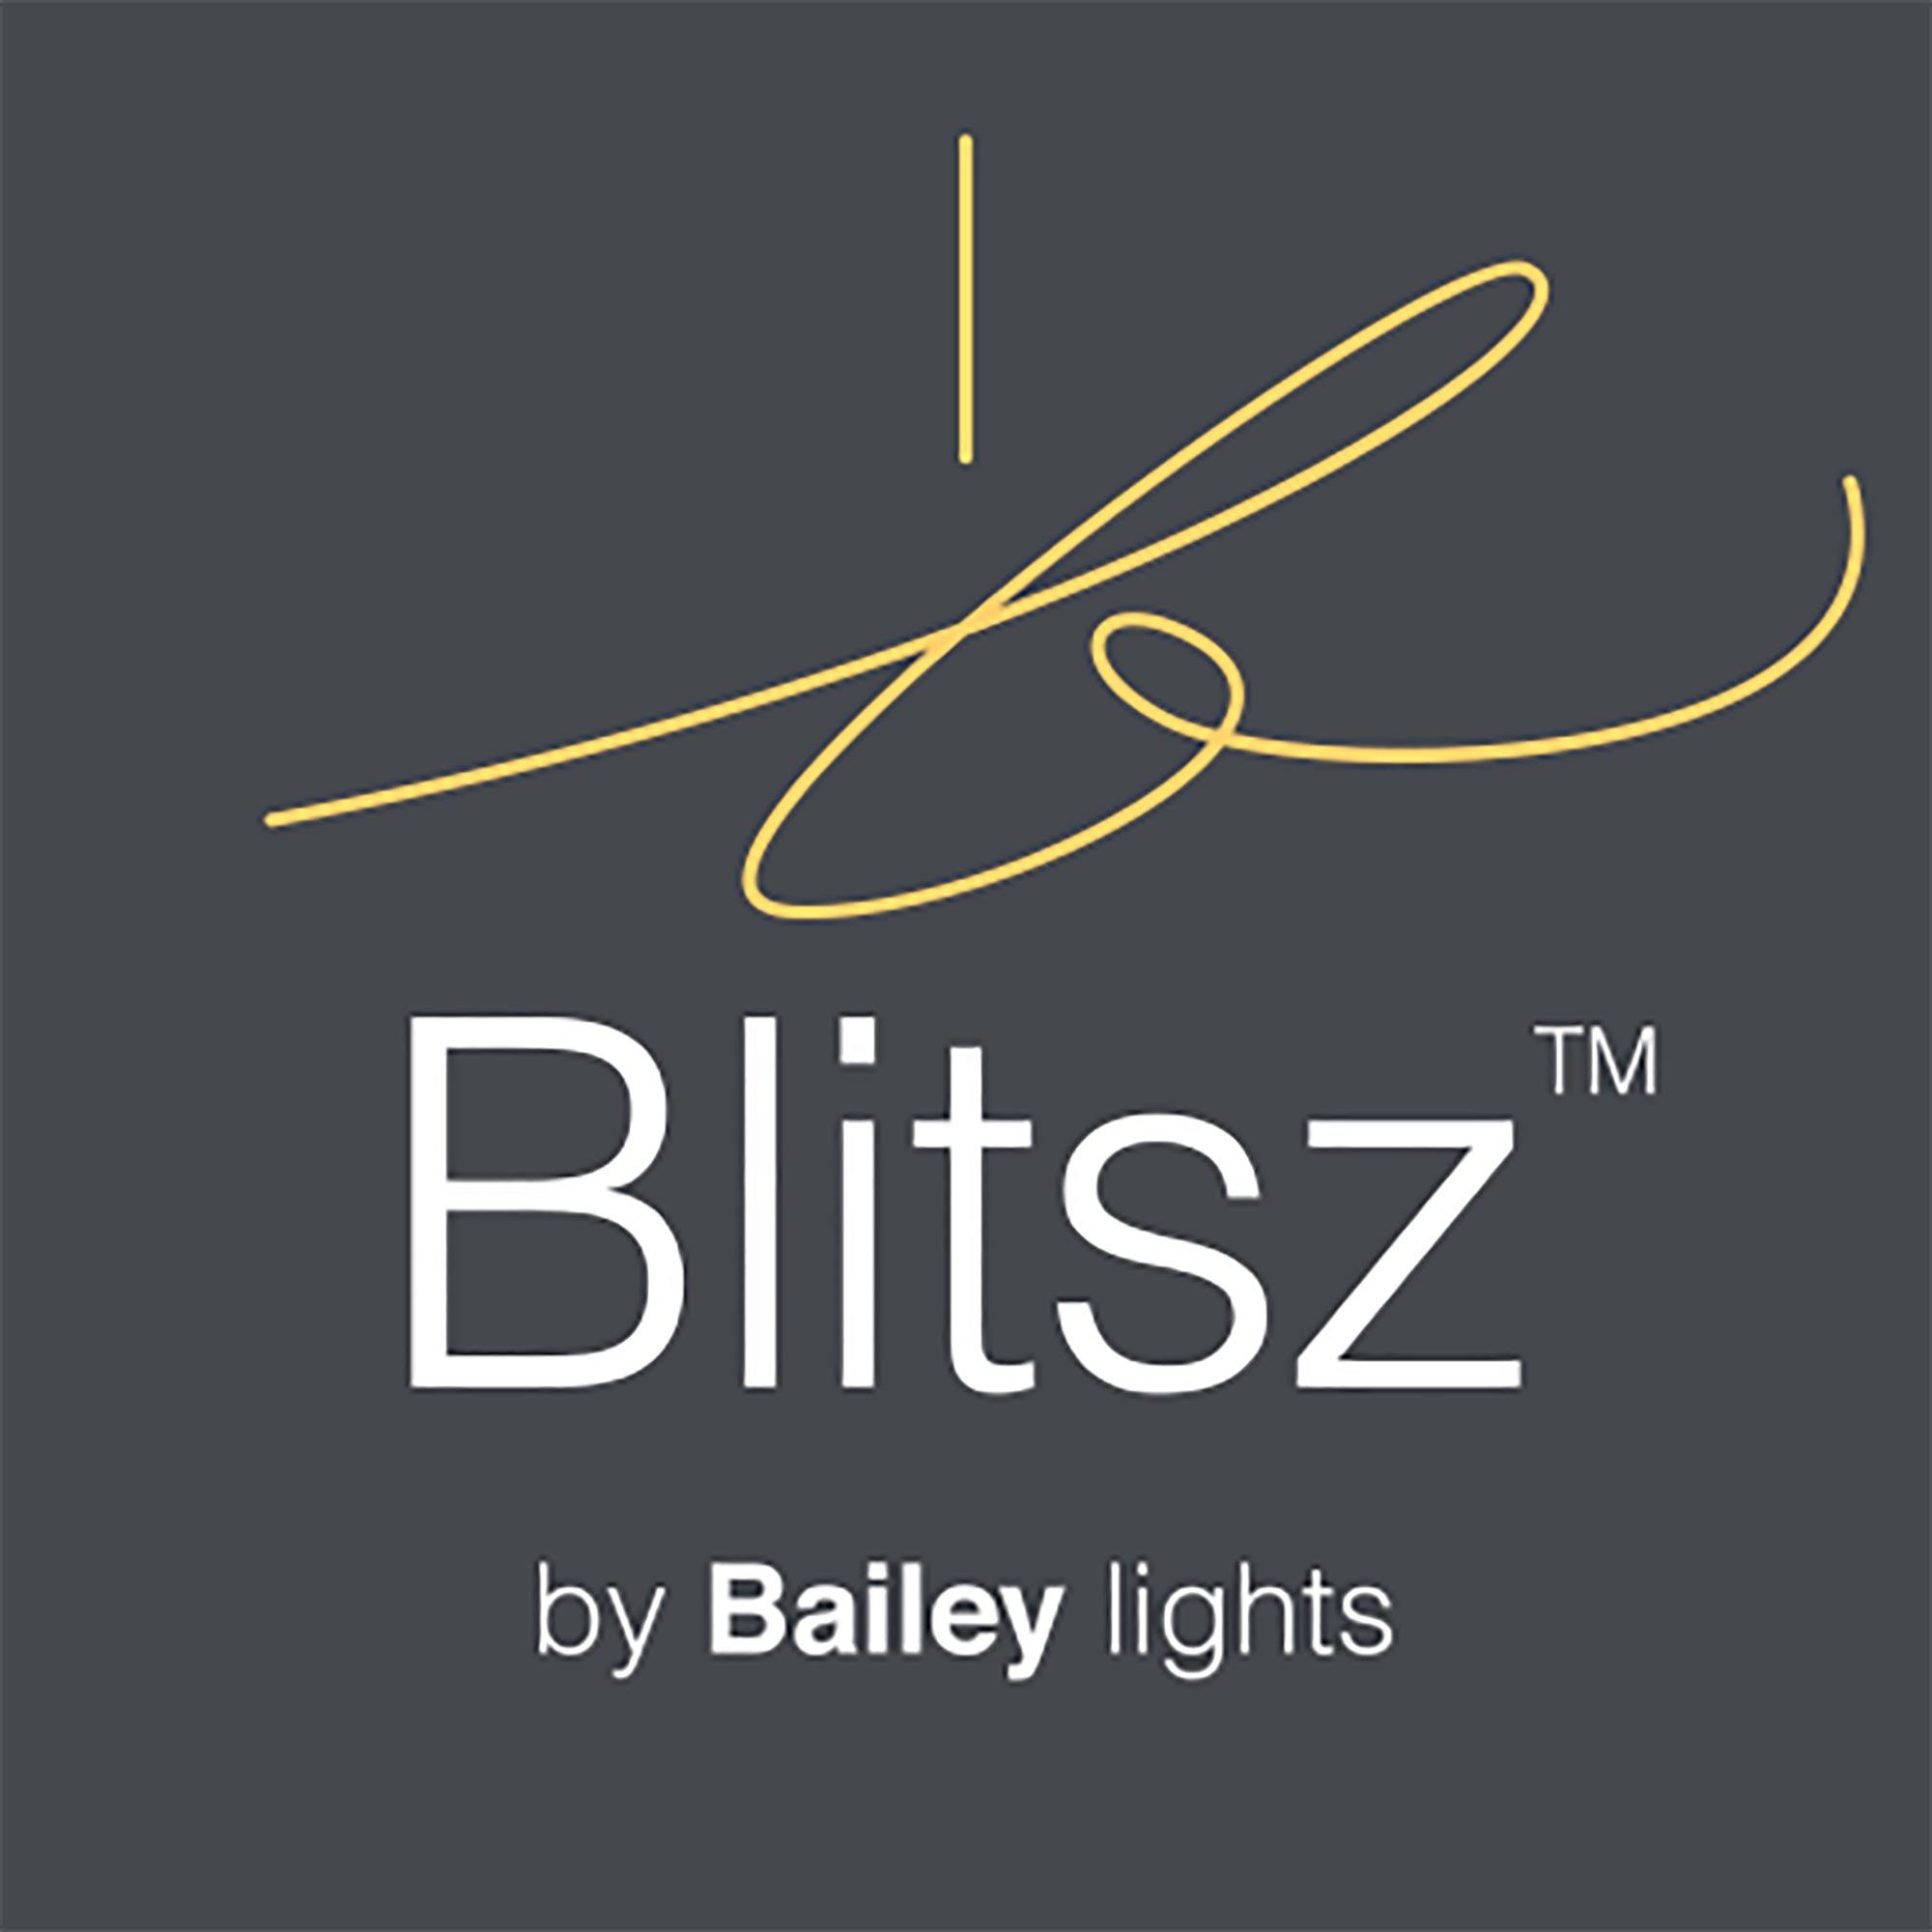 Blitsz Bailey logo ontwerp JAgd